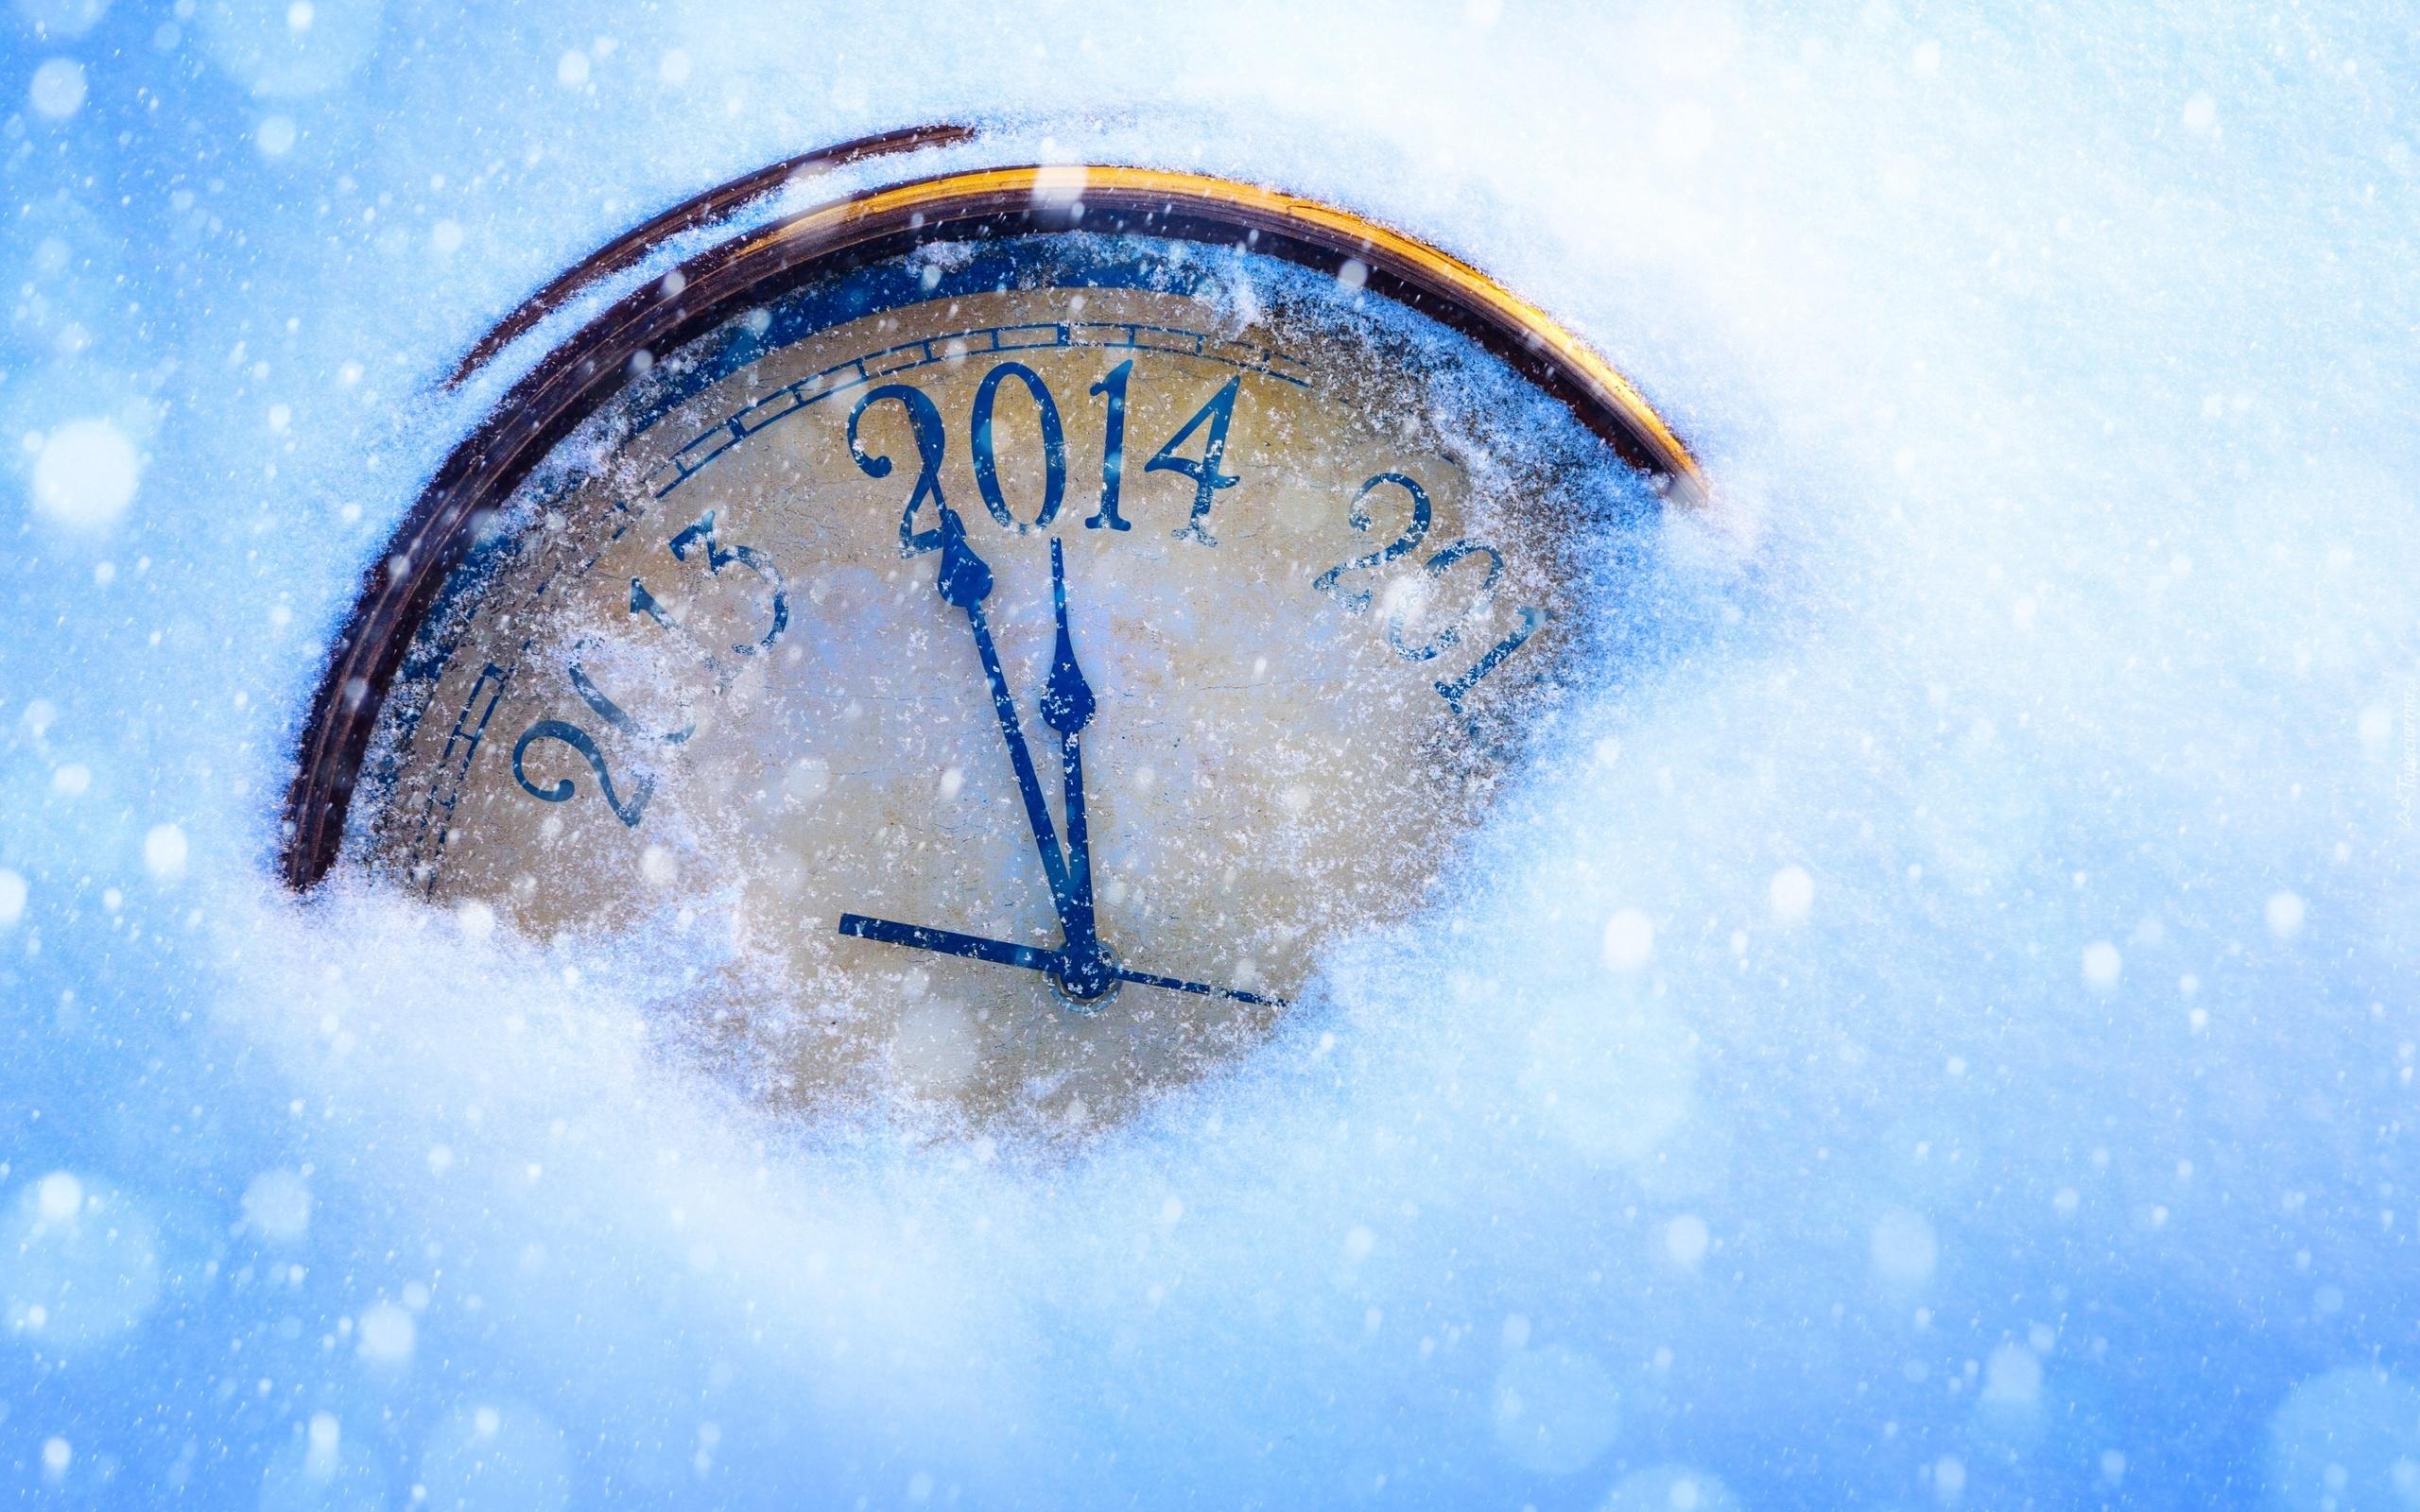 Chris Feex - End Of Year Countdown ...4... (seciki.pl)